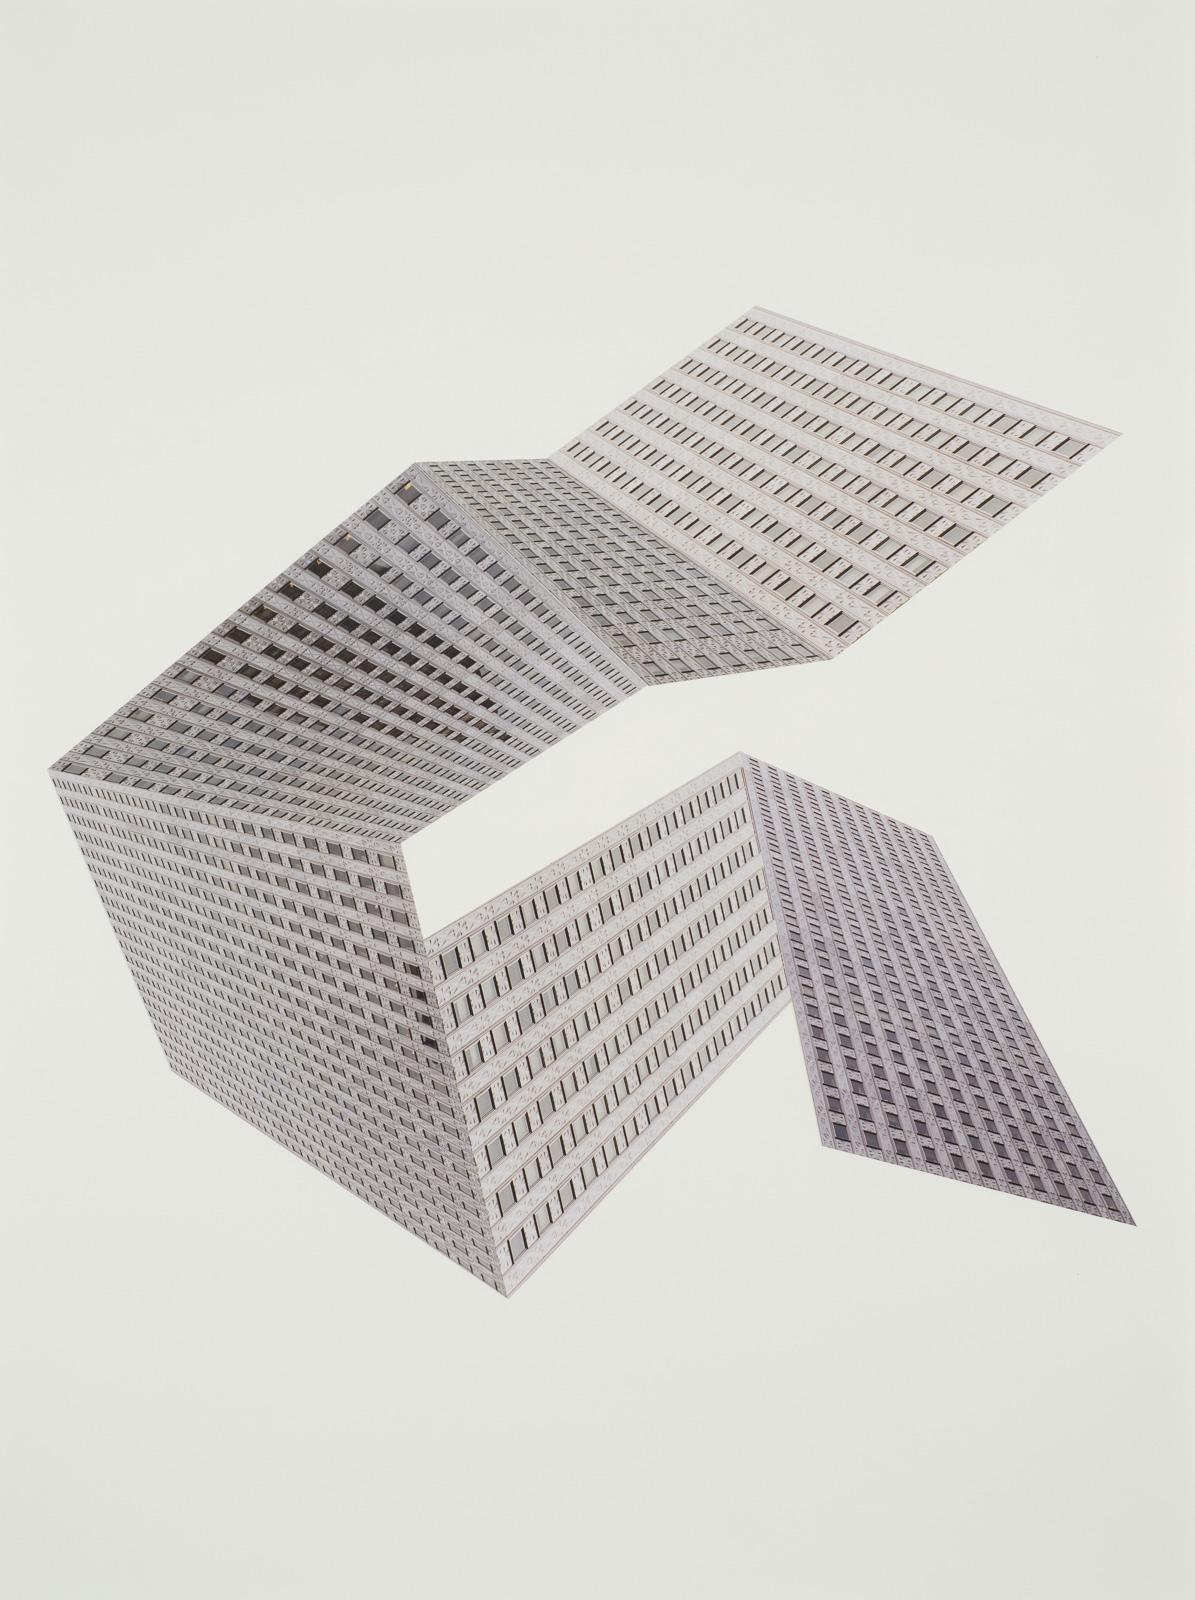 Katsuhiro Saiki, Buildings For New York City #9, 2011-2014